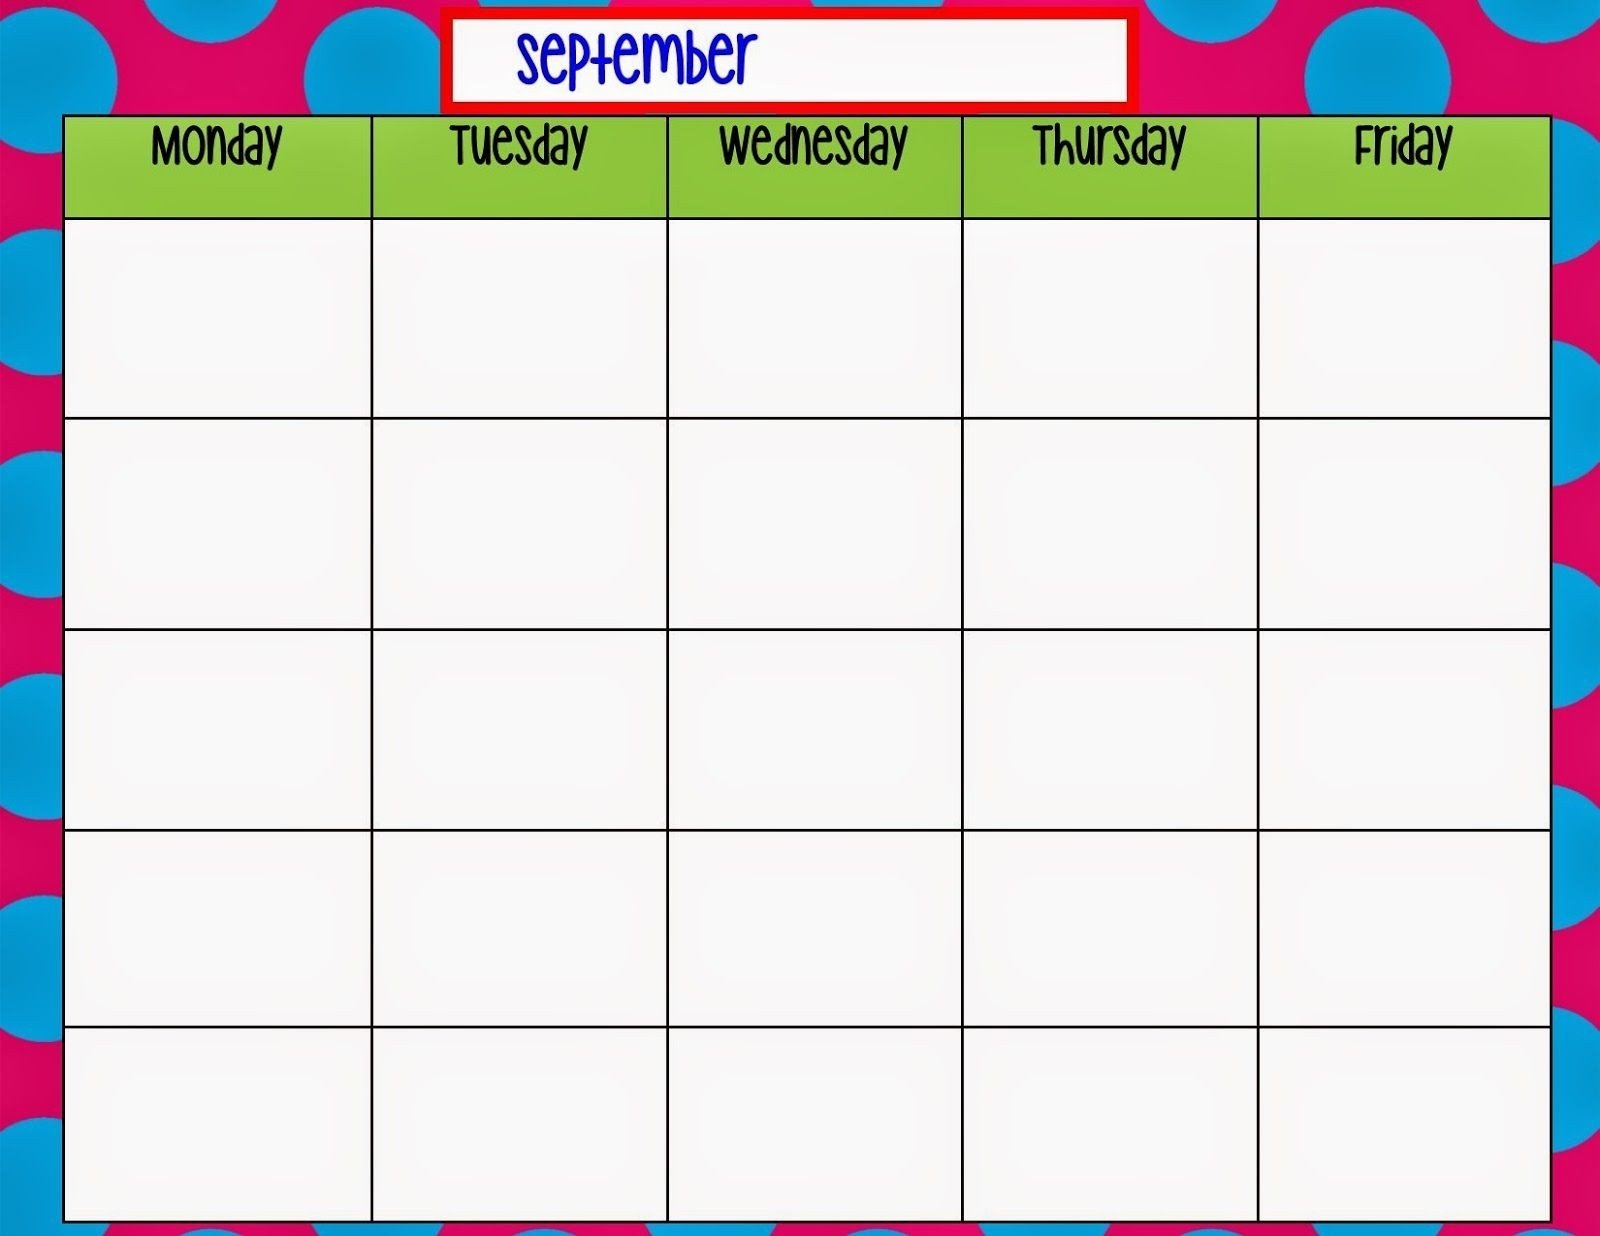 Blank Monday Through Friday Calendars | Calendar Template Monday Thru Friday Printable Calendar Free